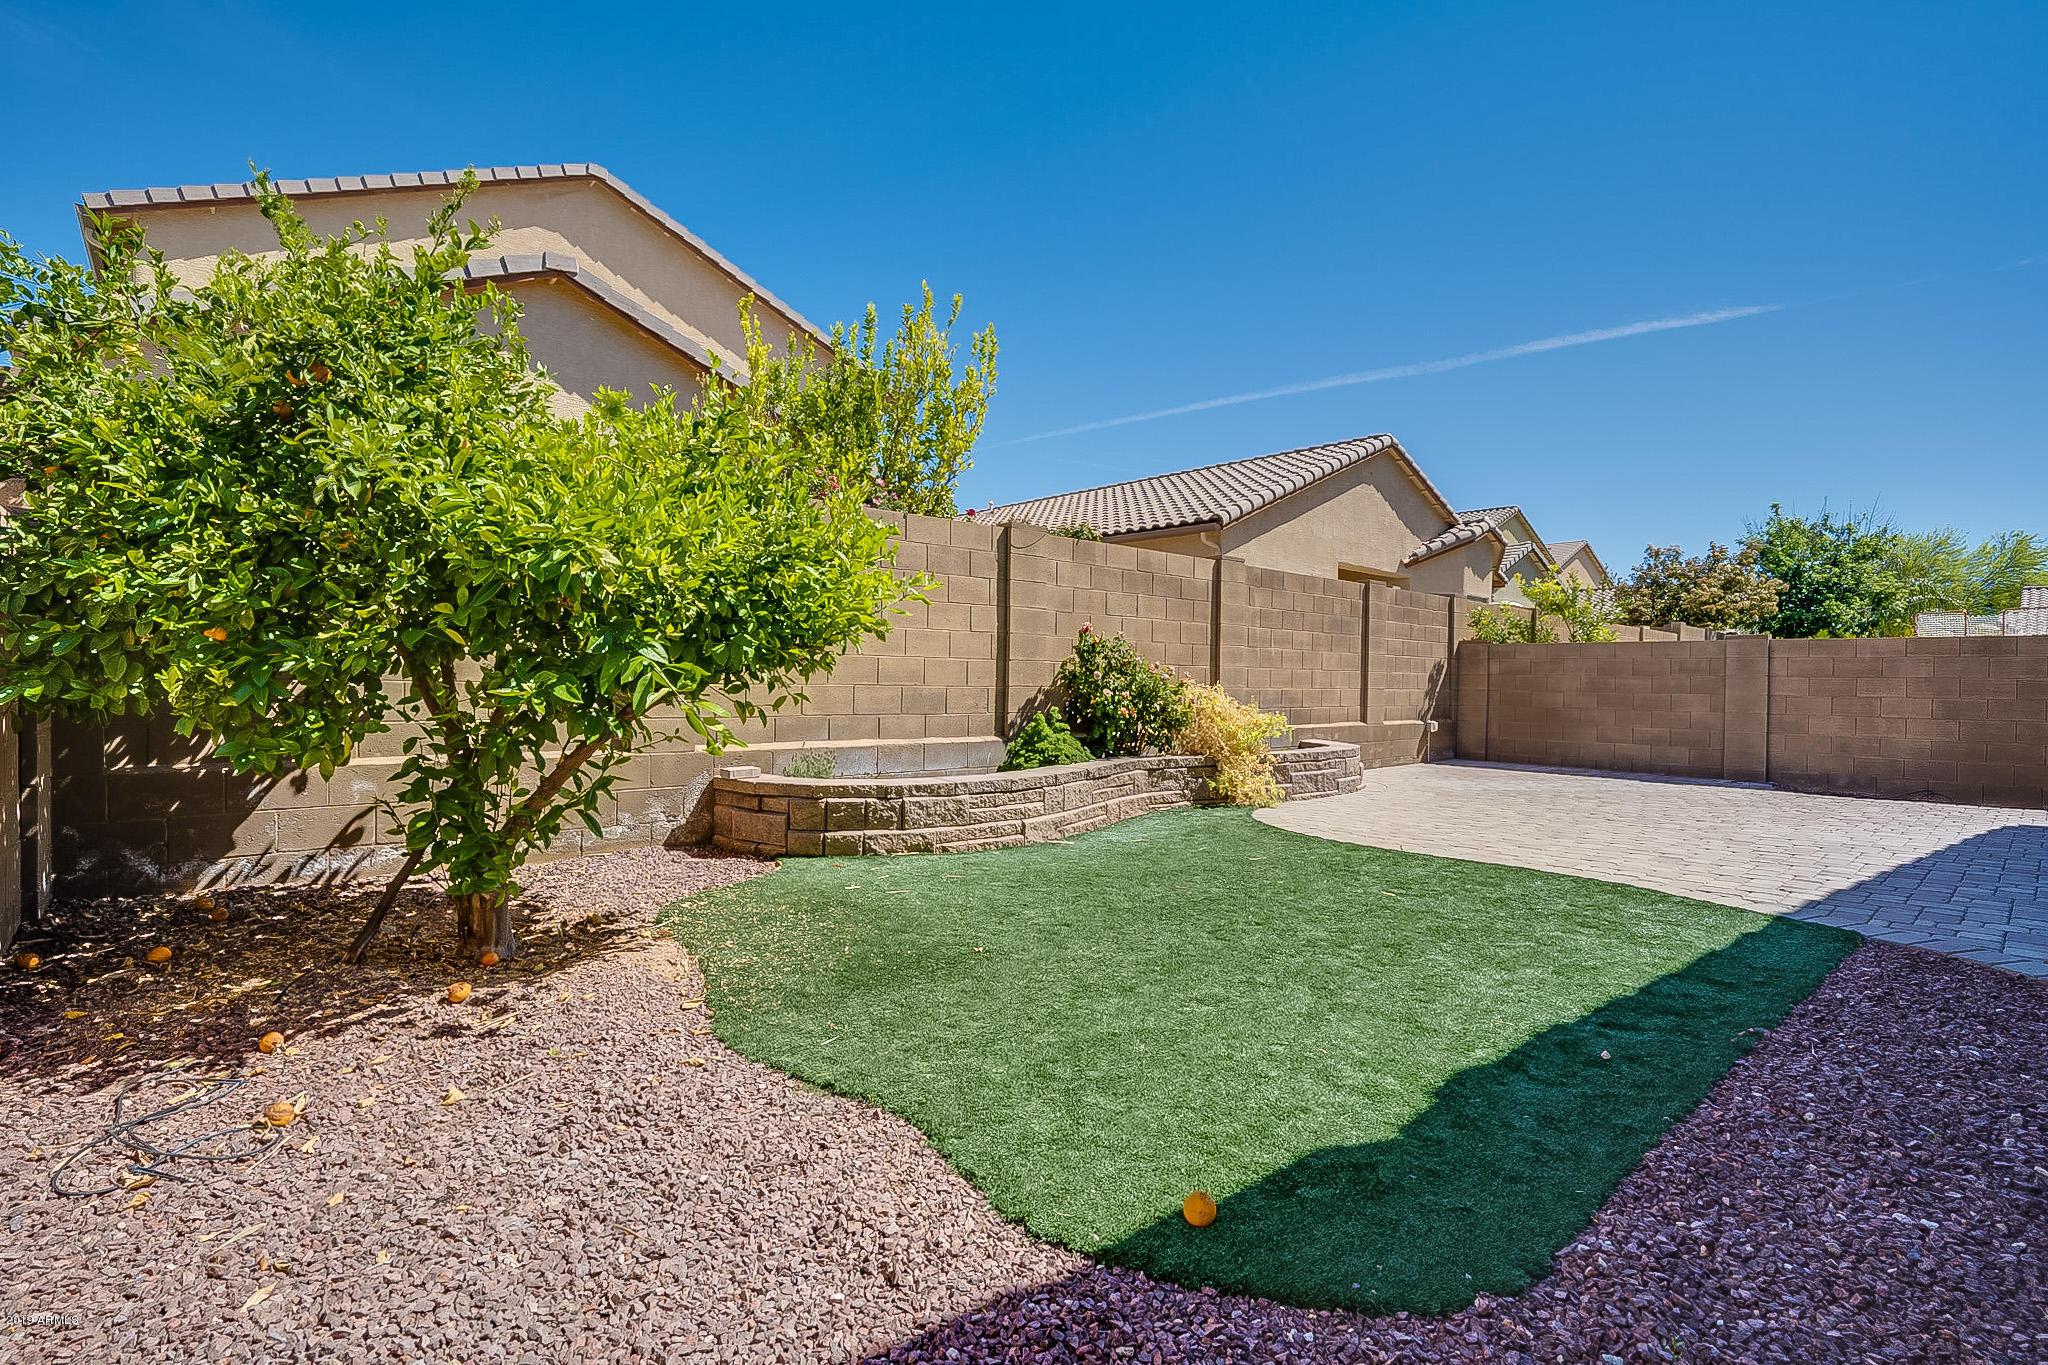 MLS 5915006 1262 W VARESE Way, Tucson, AZ 85755